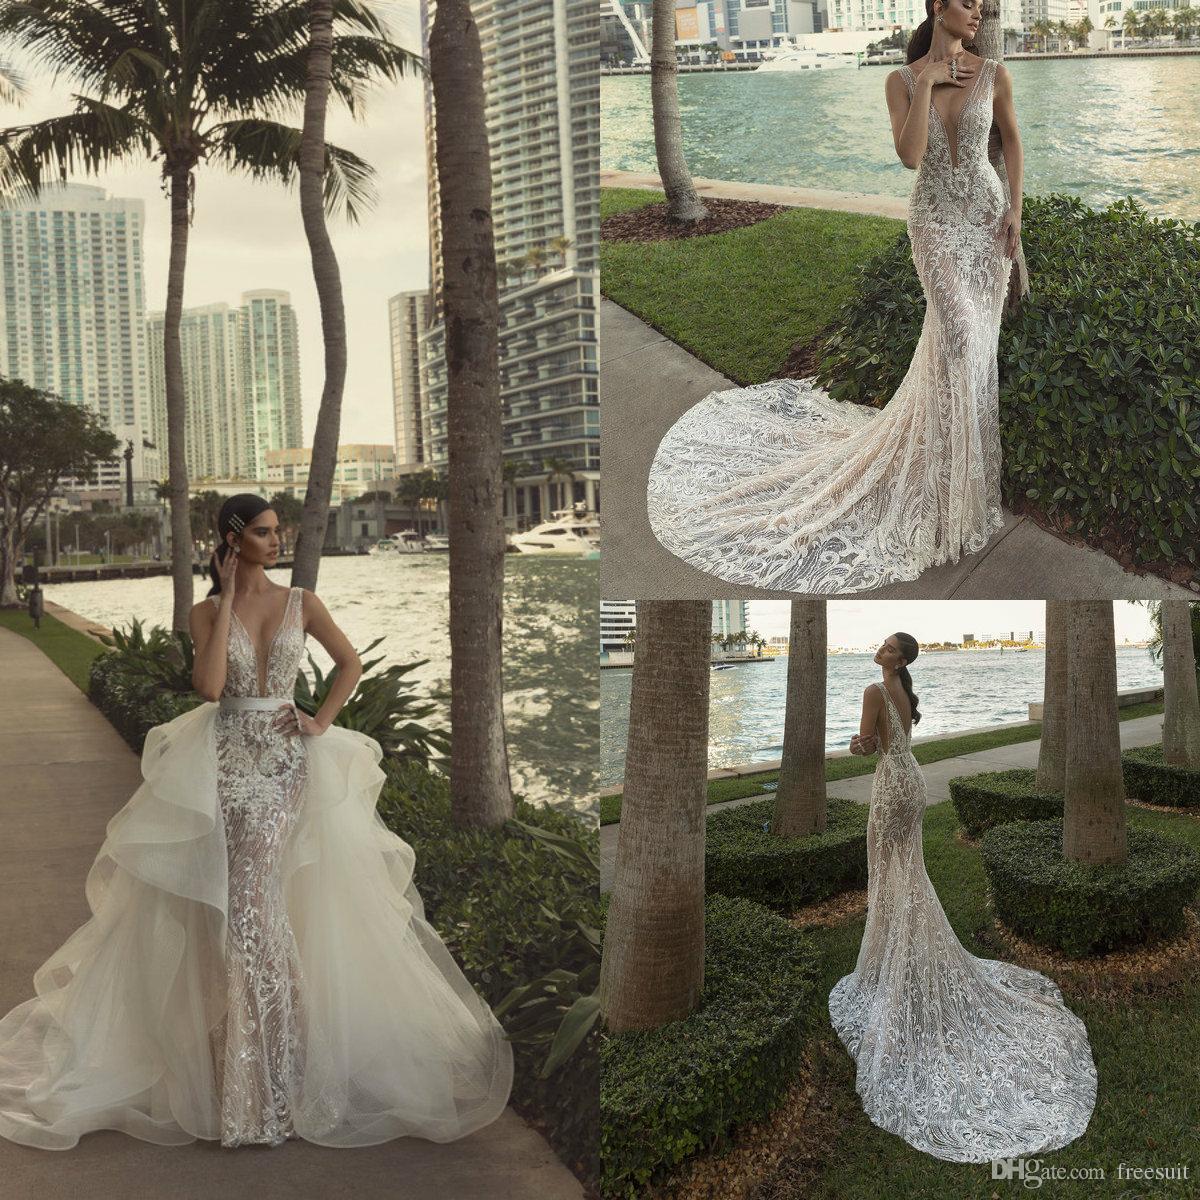 2020 Mermaid Wedding Dresses With Detachable Train Beaded Sequins 3D Floral Appliqued Lace Bridal Gowns Custom Made Vestidos De Novia